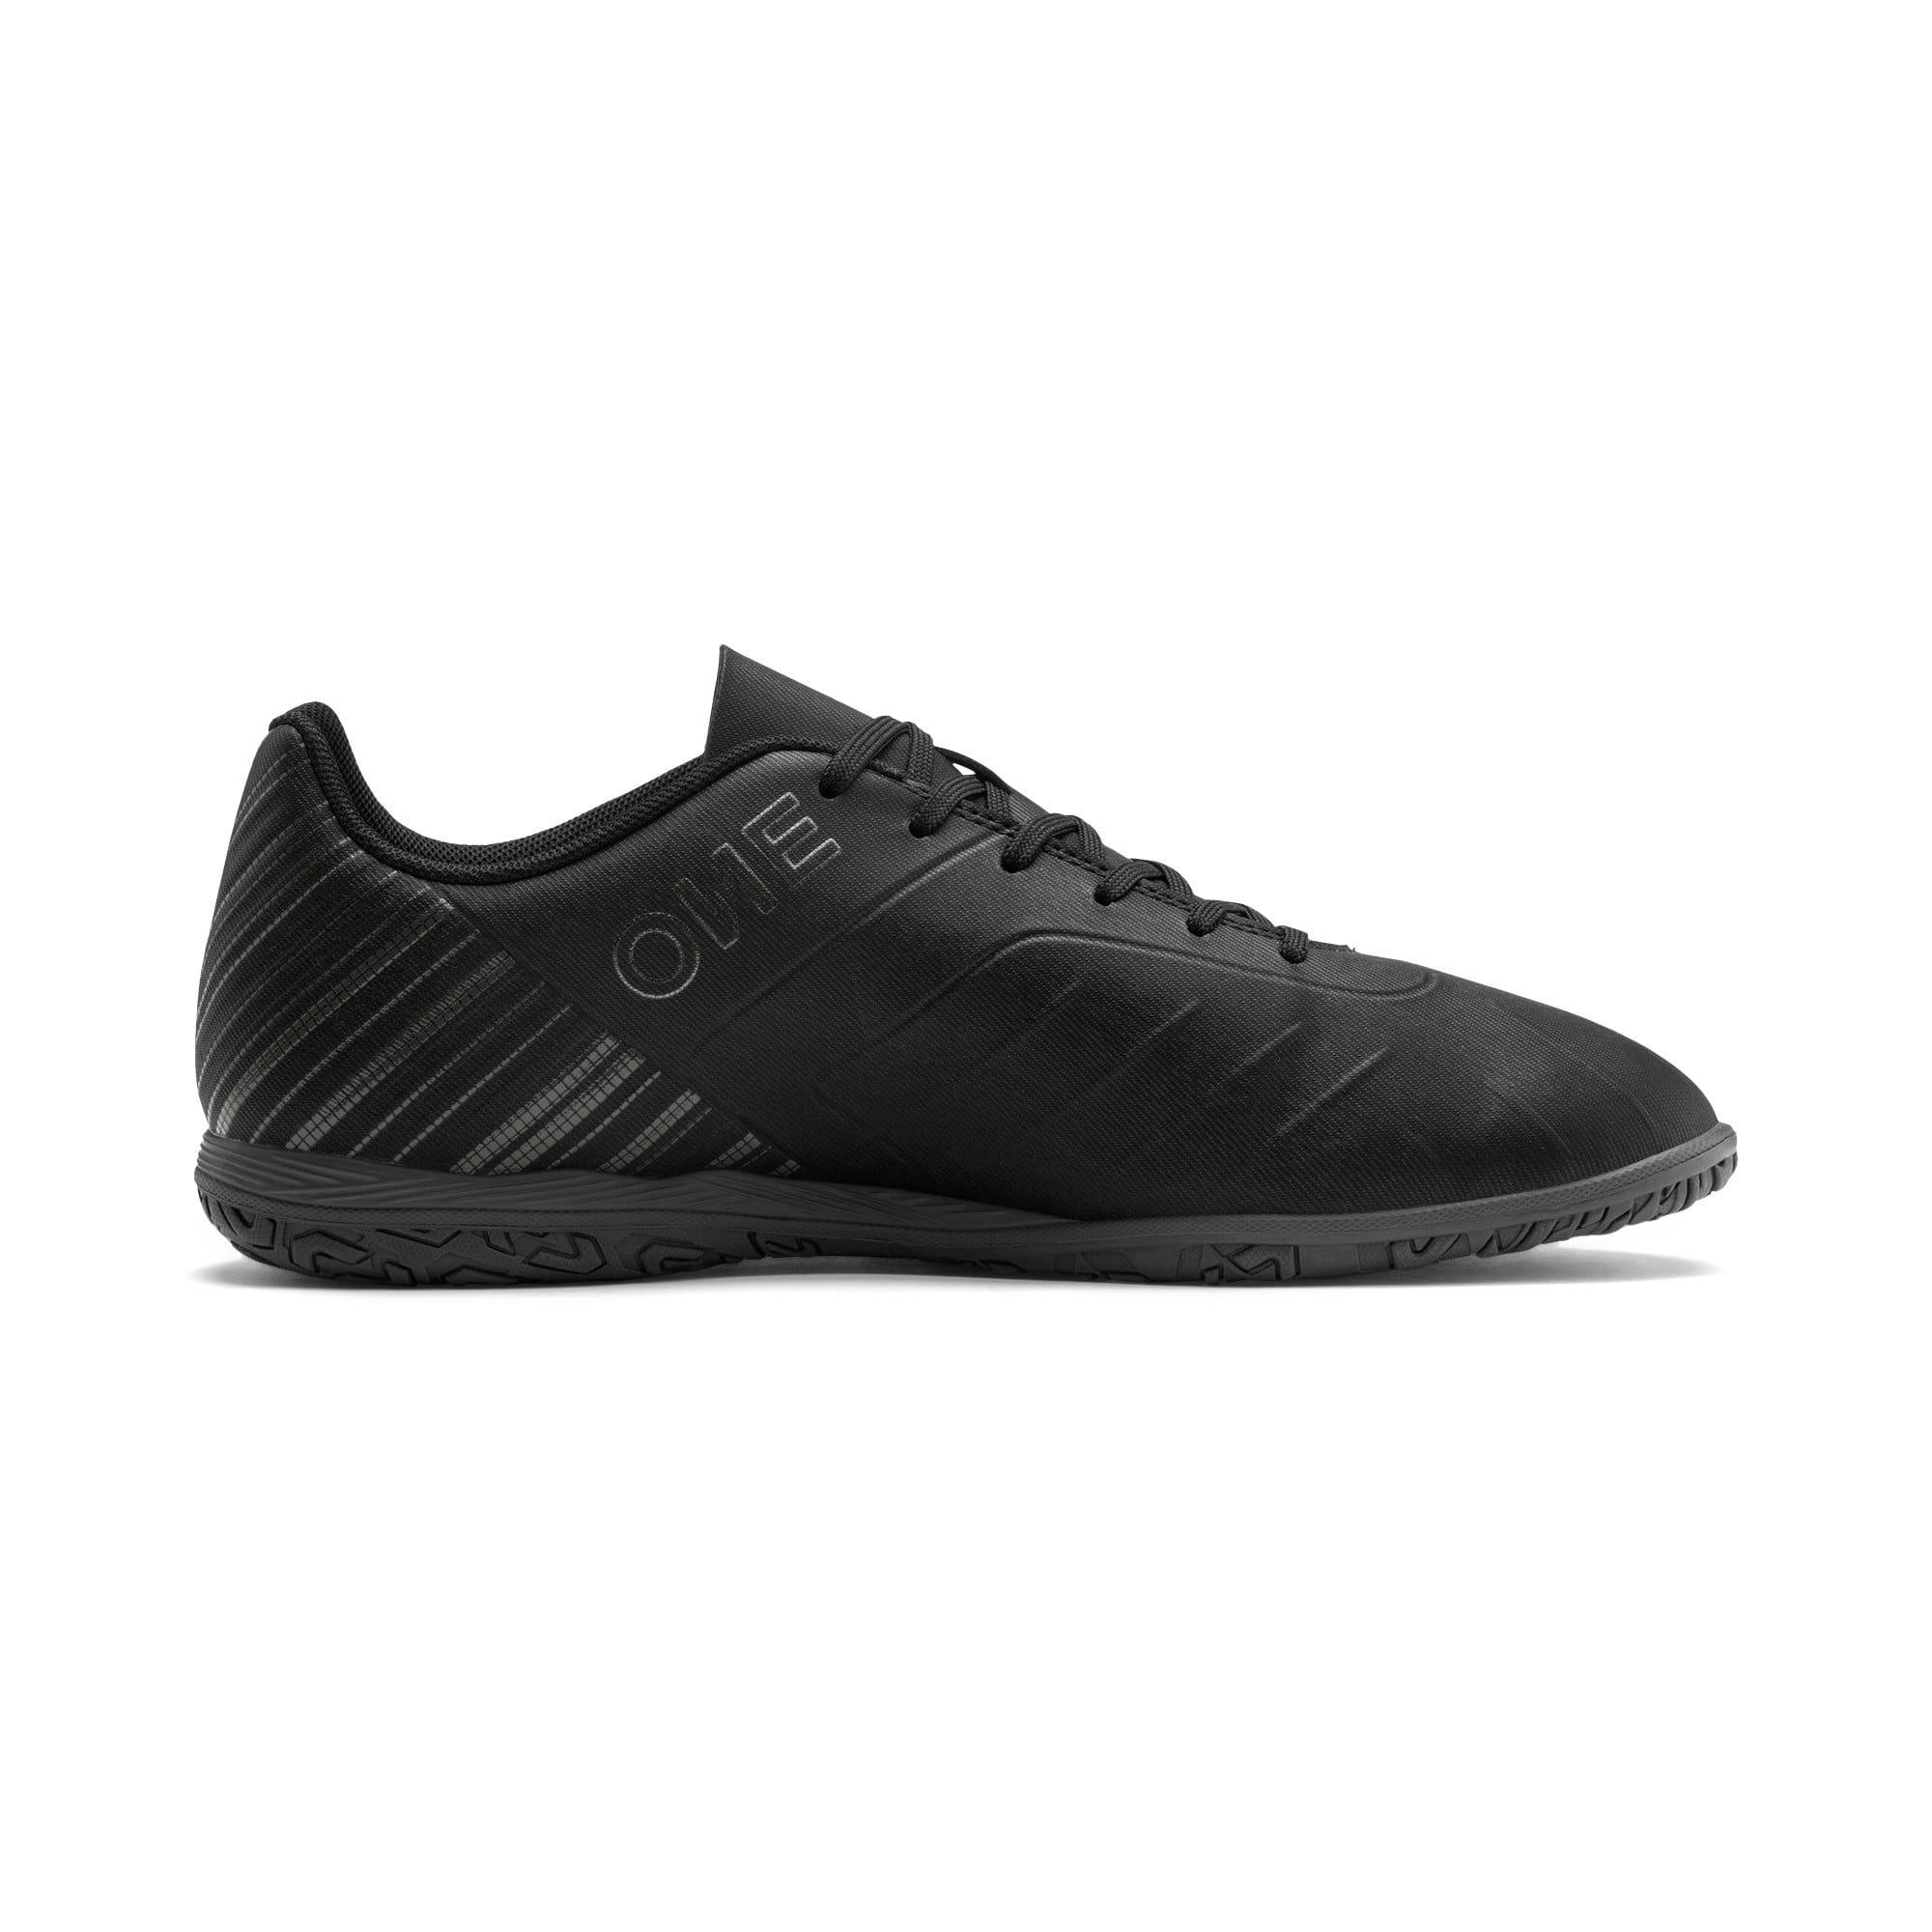 Thumbnail 6 of PUMA ONE 5.4 IT Men's Football Boots, Black-Black-Puma Aged Silver, medium